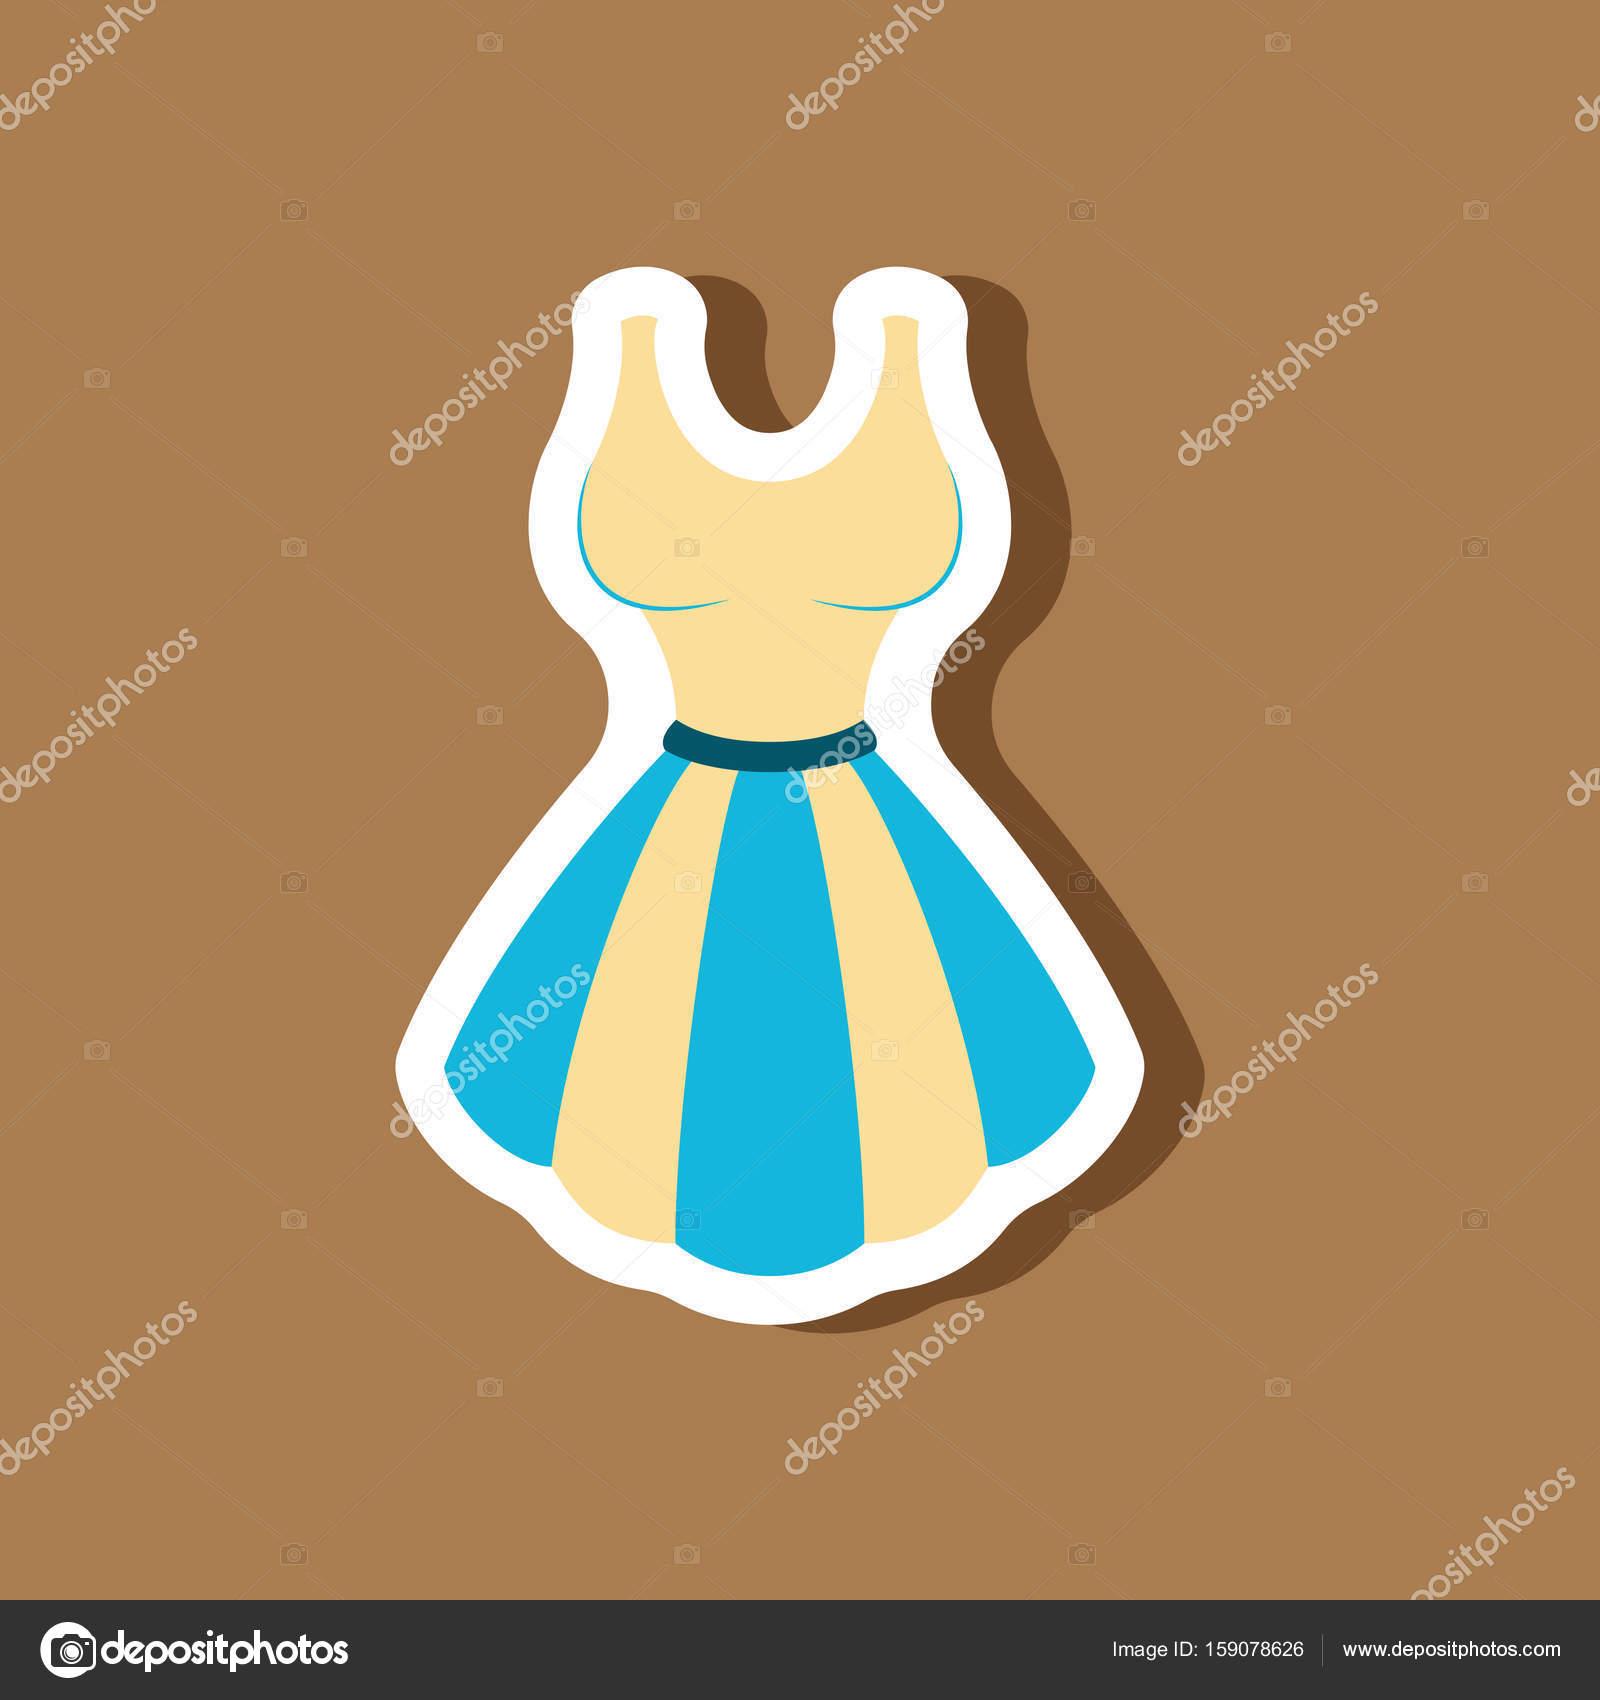 Etiket: kabarık elbise